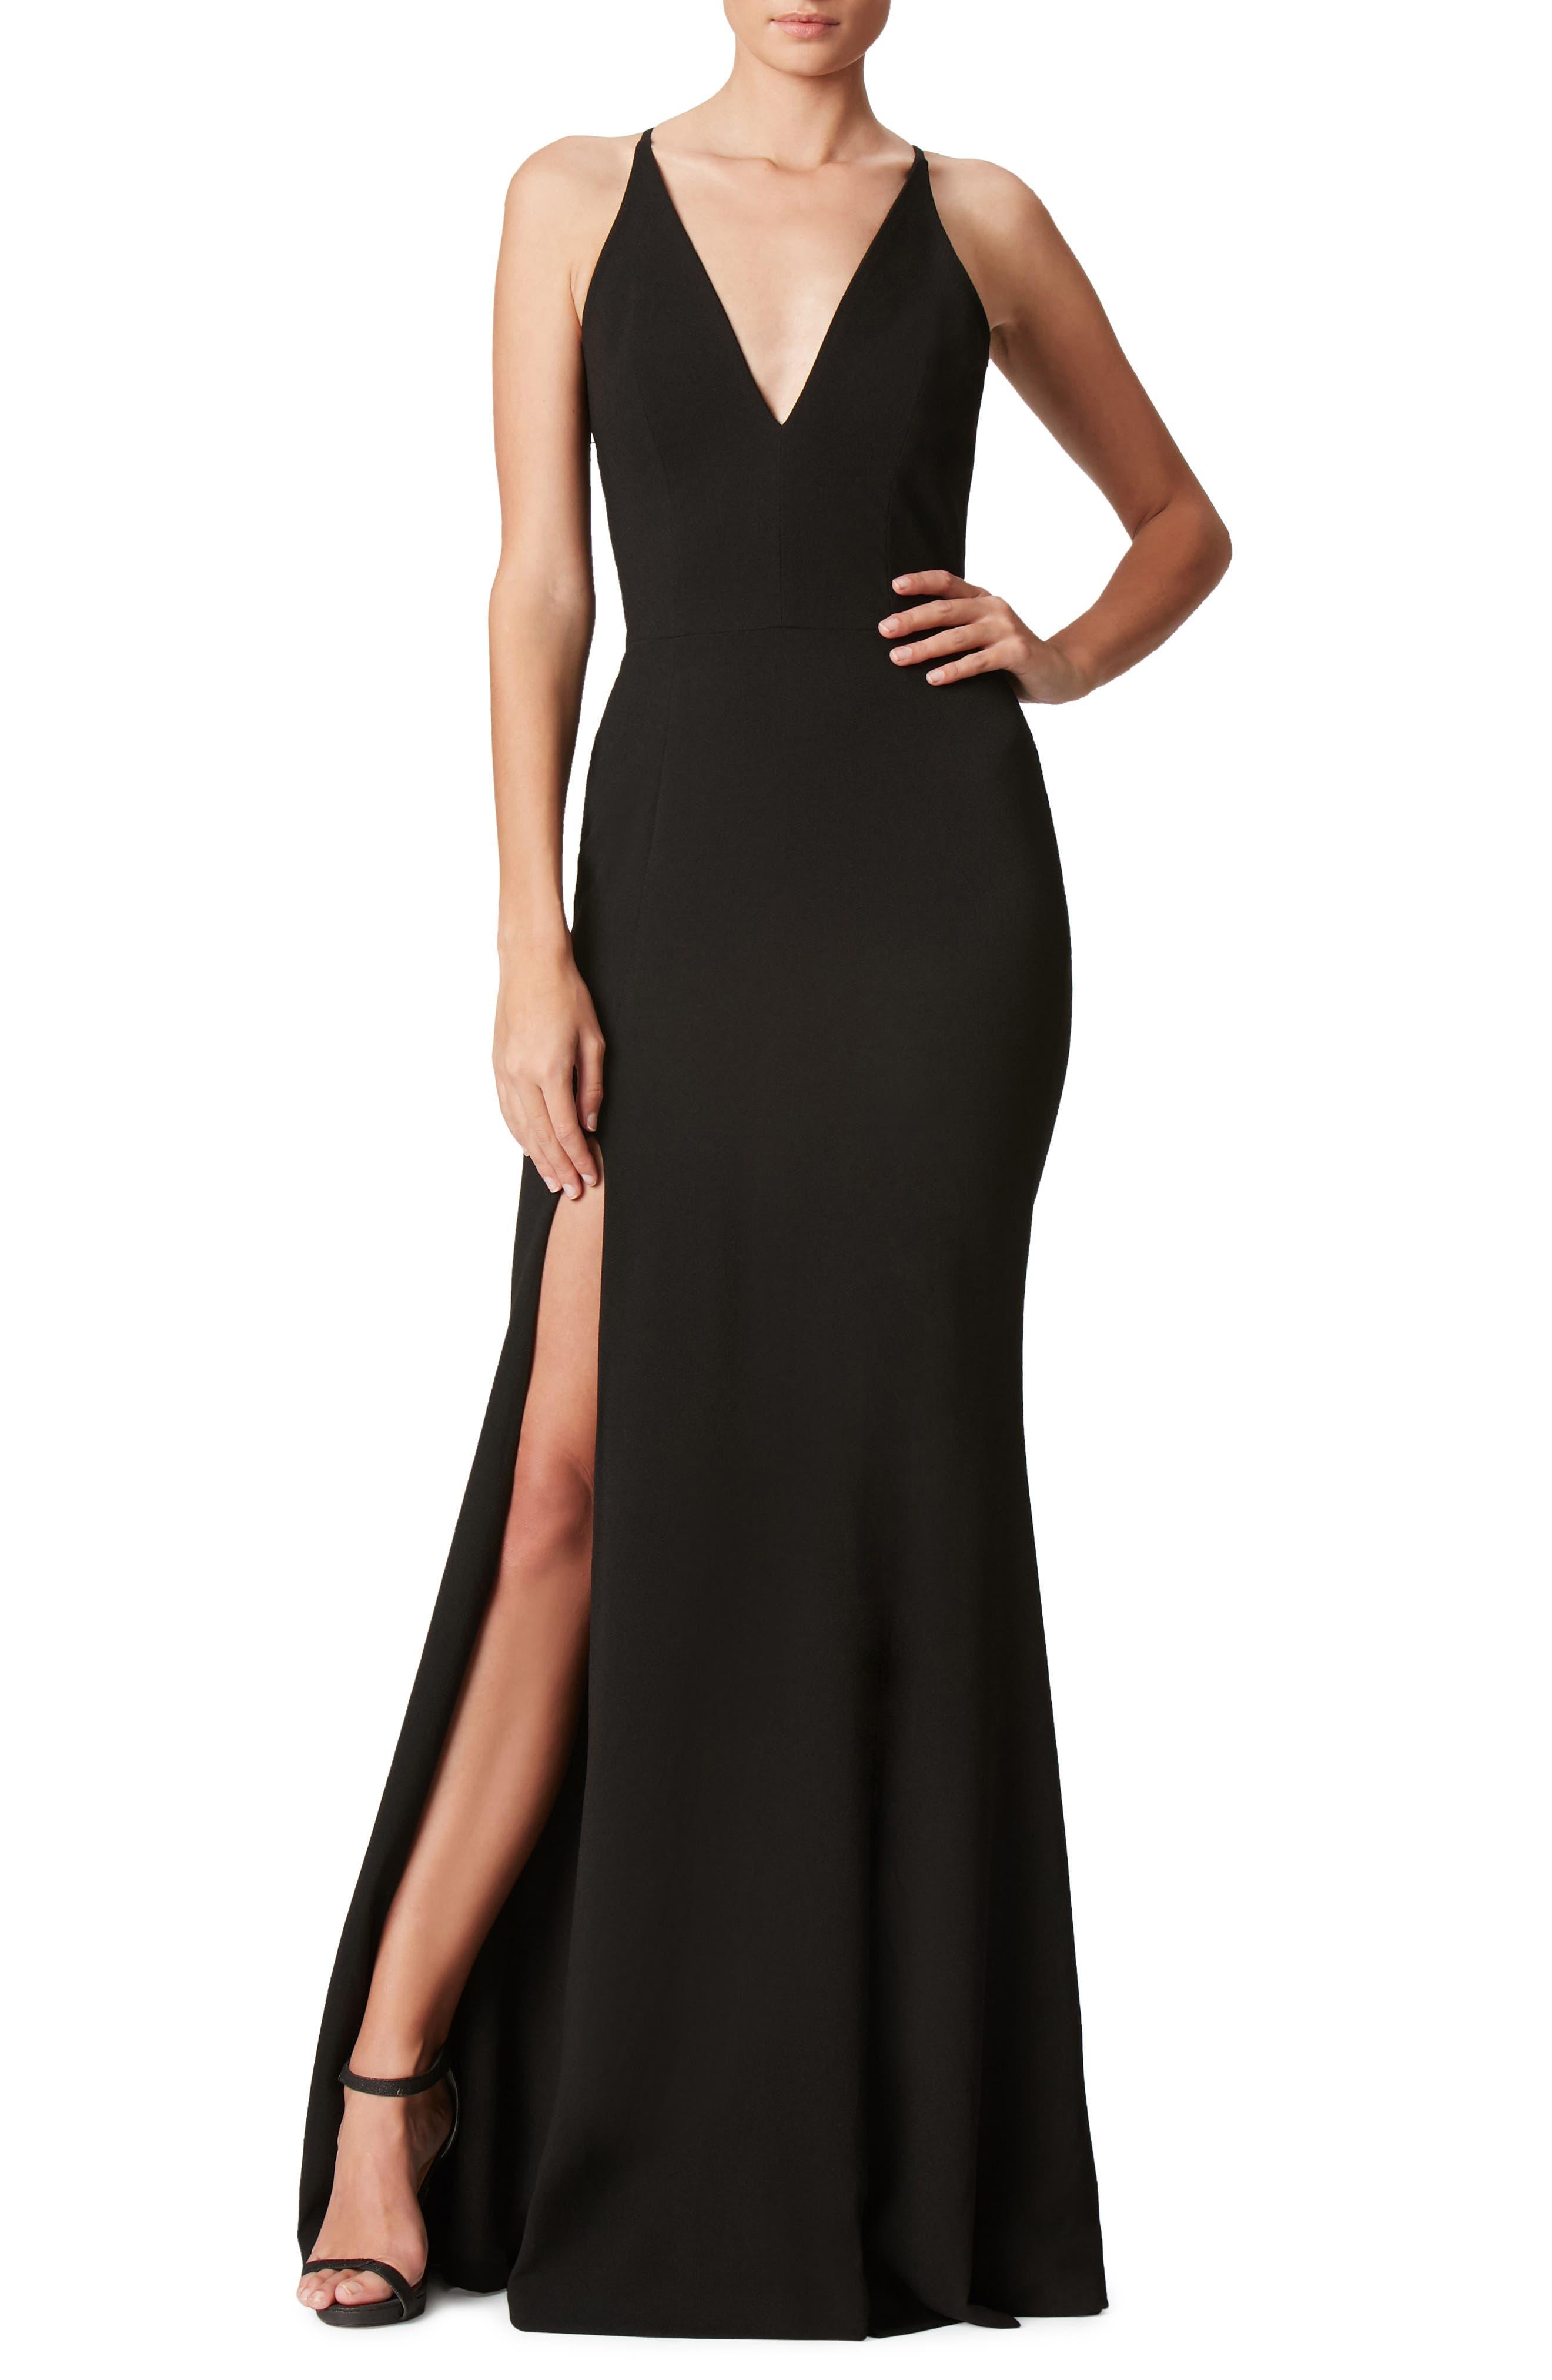 DRESS THE POPULATION Iris Slit Crepe Gown, Main, color, BLACK